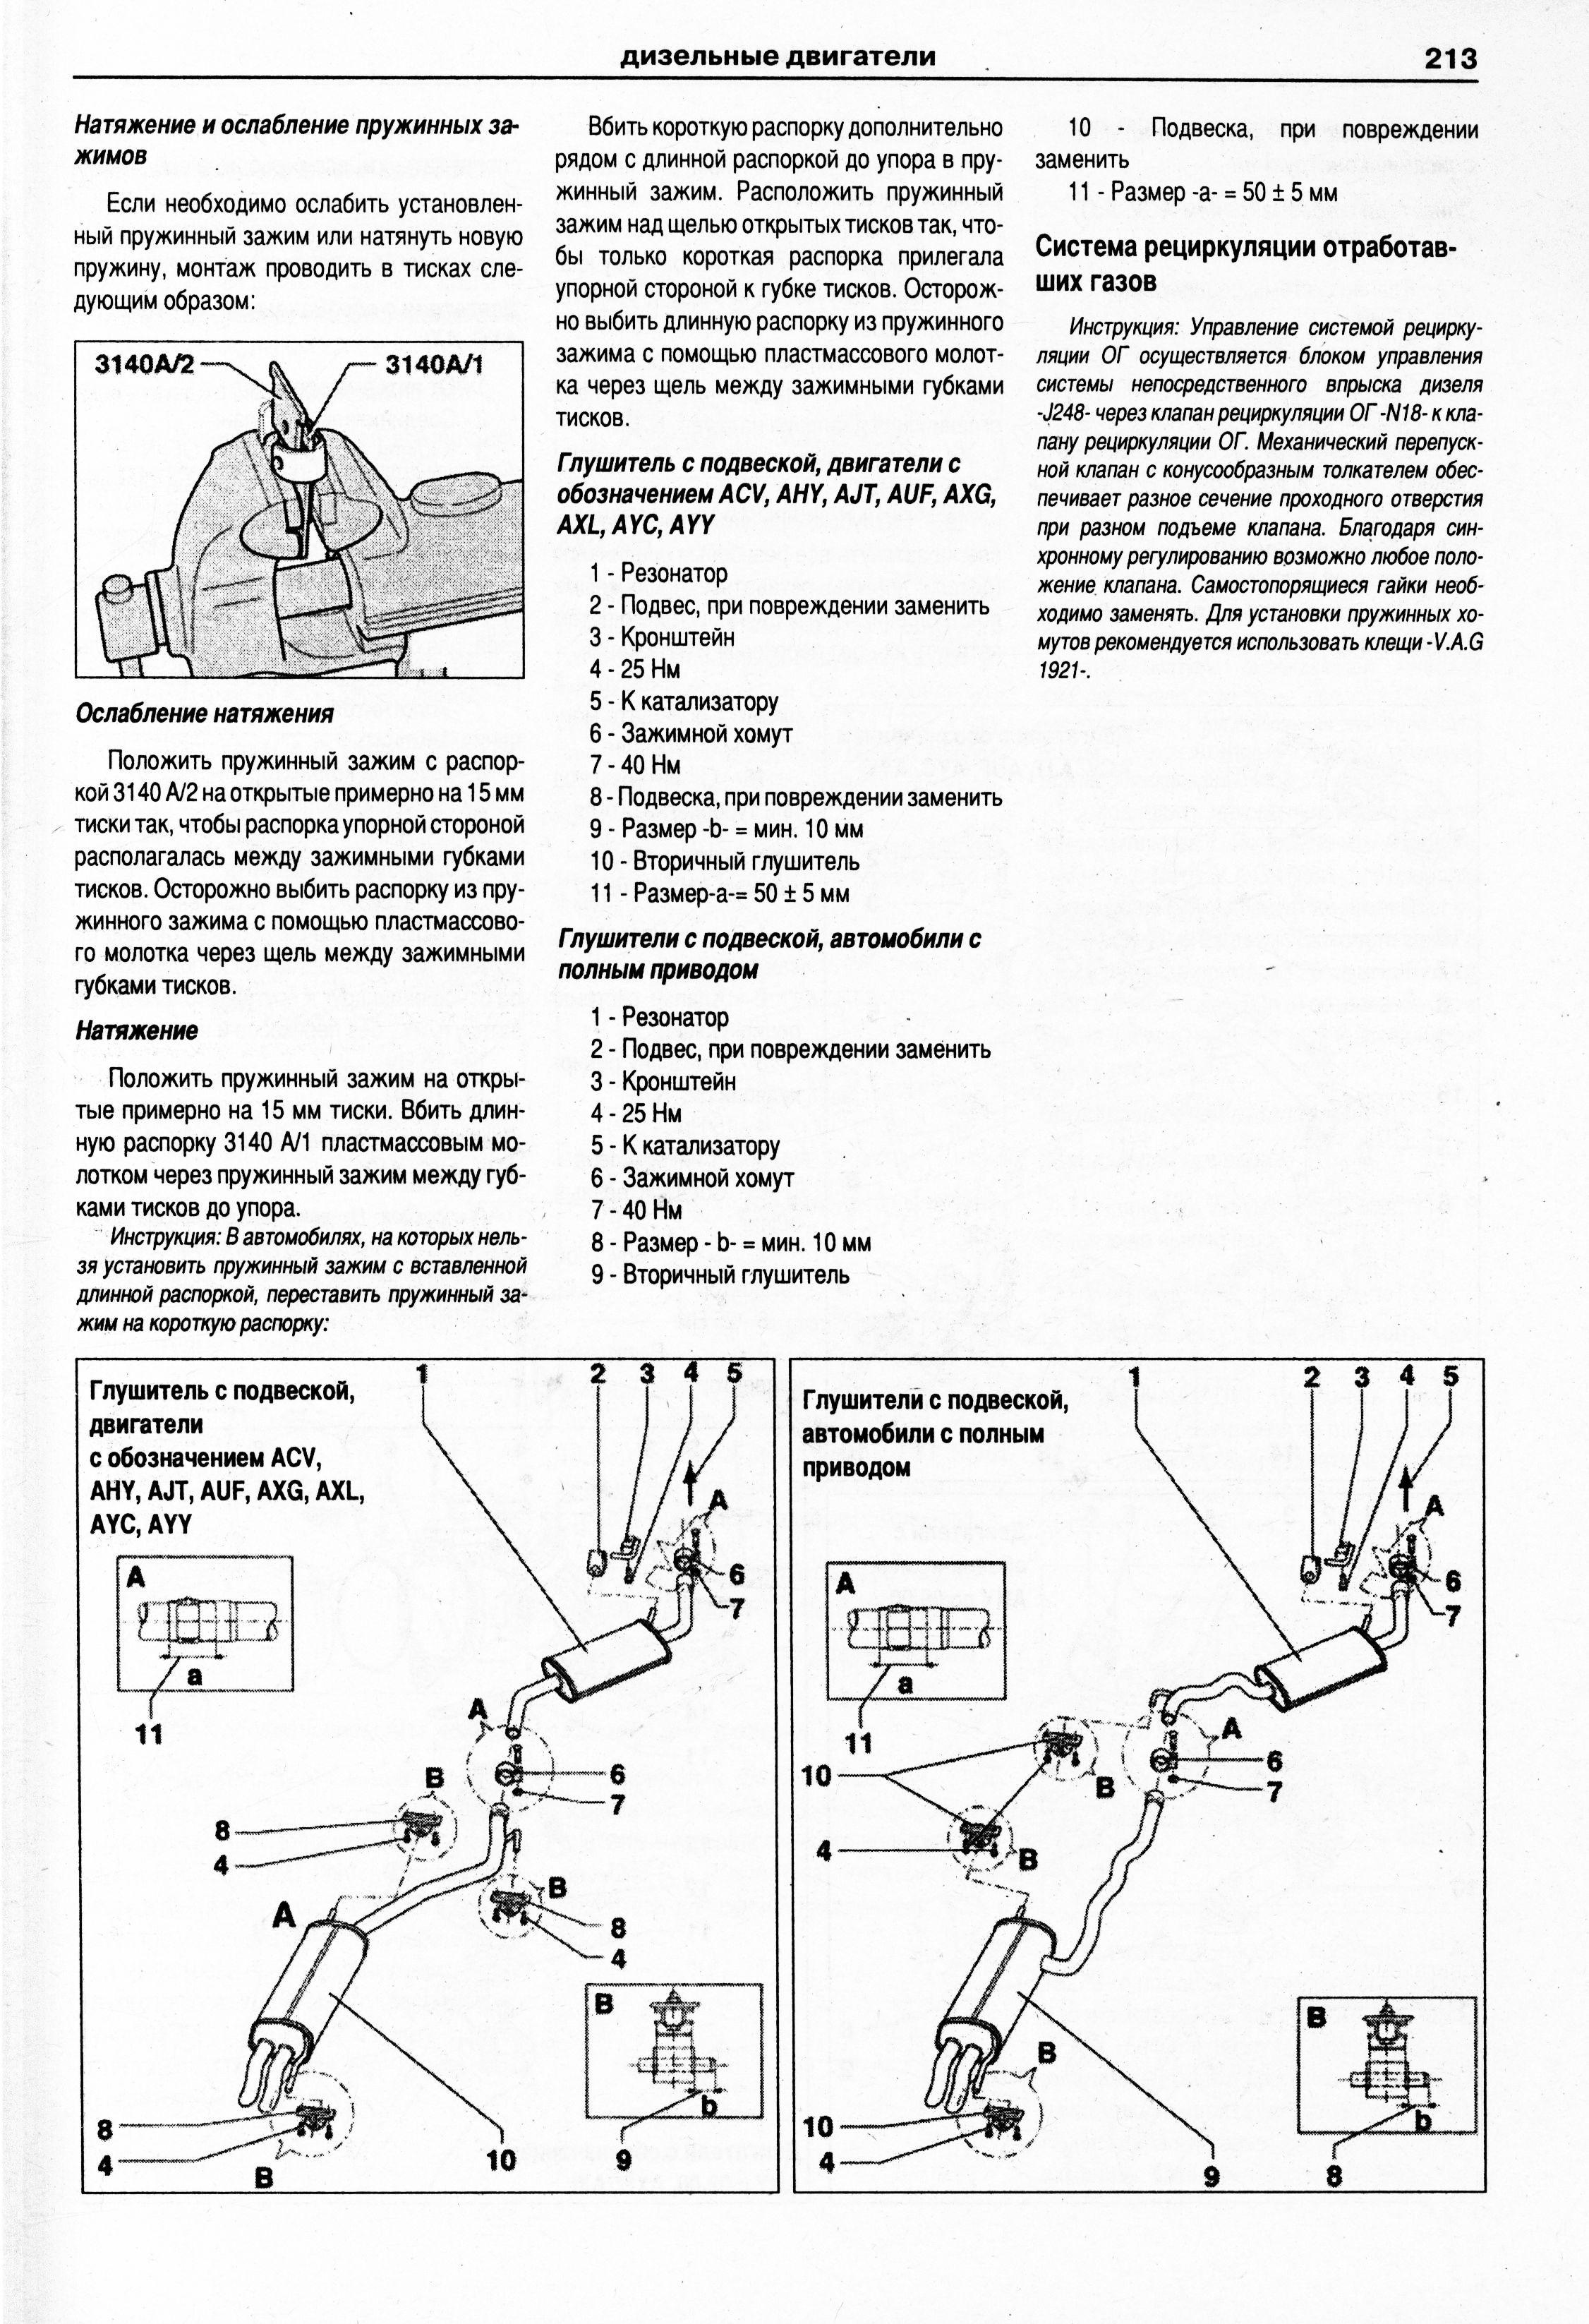 инструкция по ремонту митсубиси аутлендер 2003